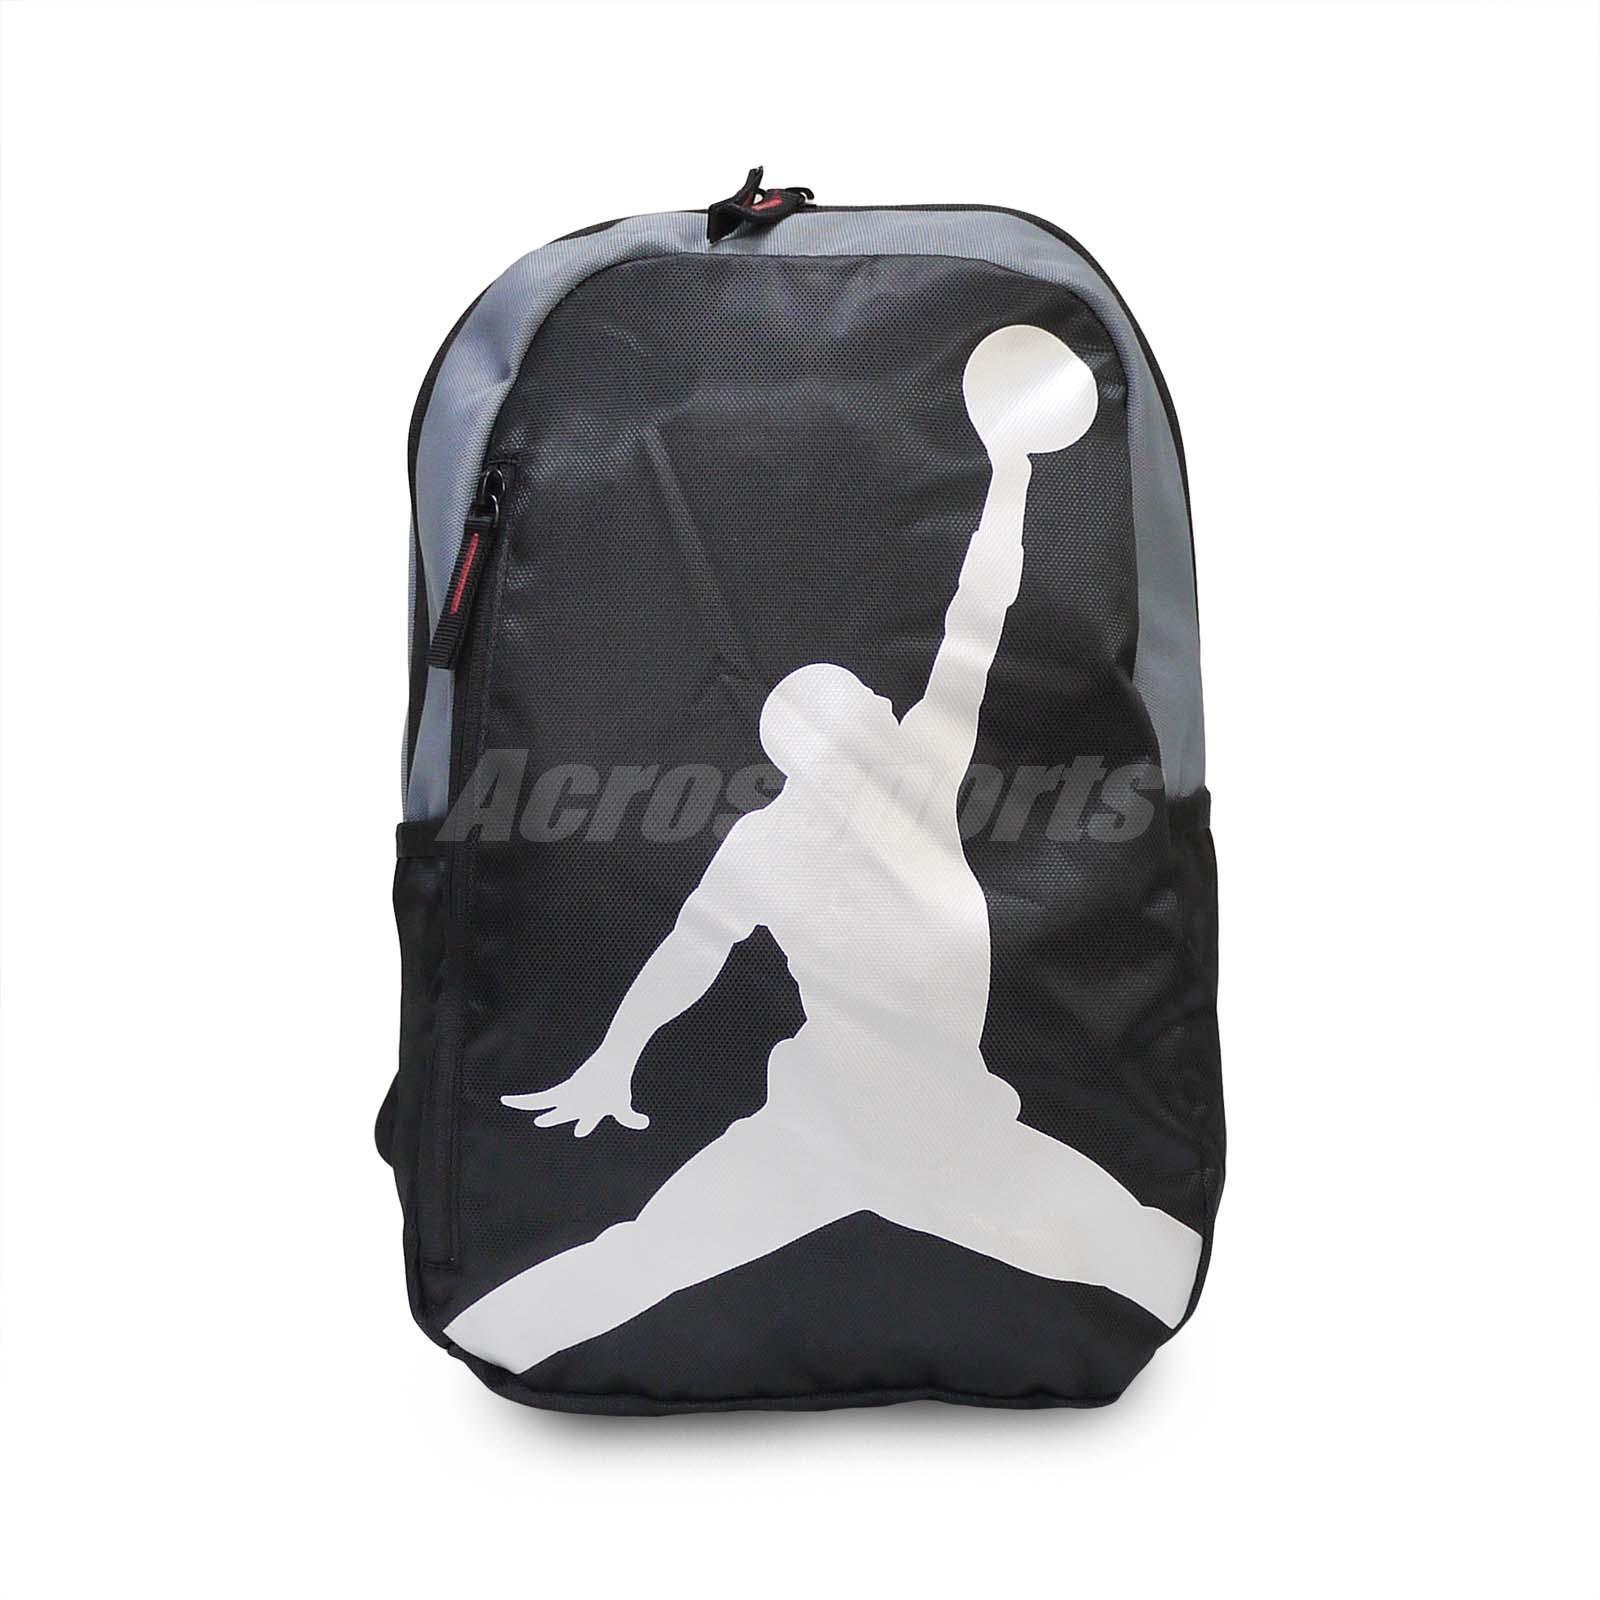 44b63ce99f5 Details about Nike Air Jordan ISO Grey Medium Silver Black Jumpman Backpack  Bag 8A1911-023